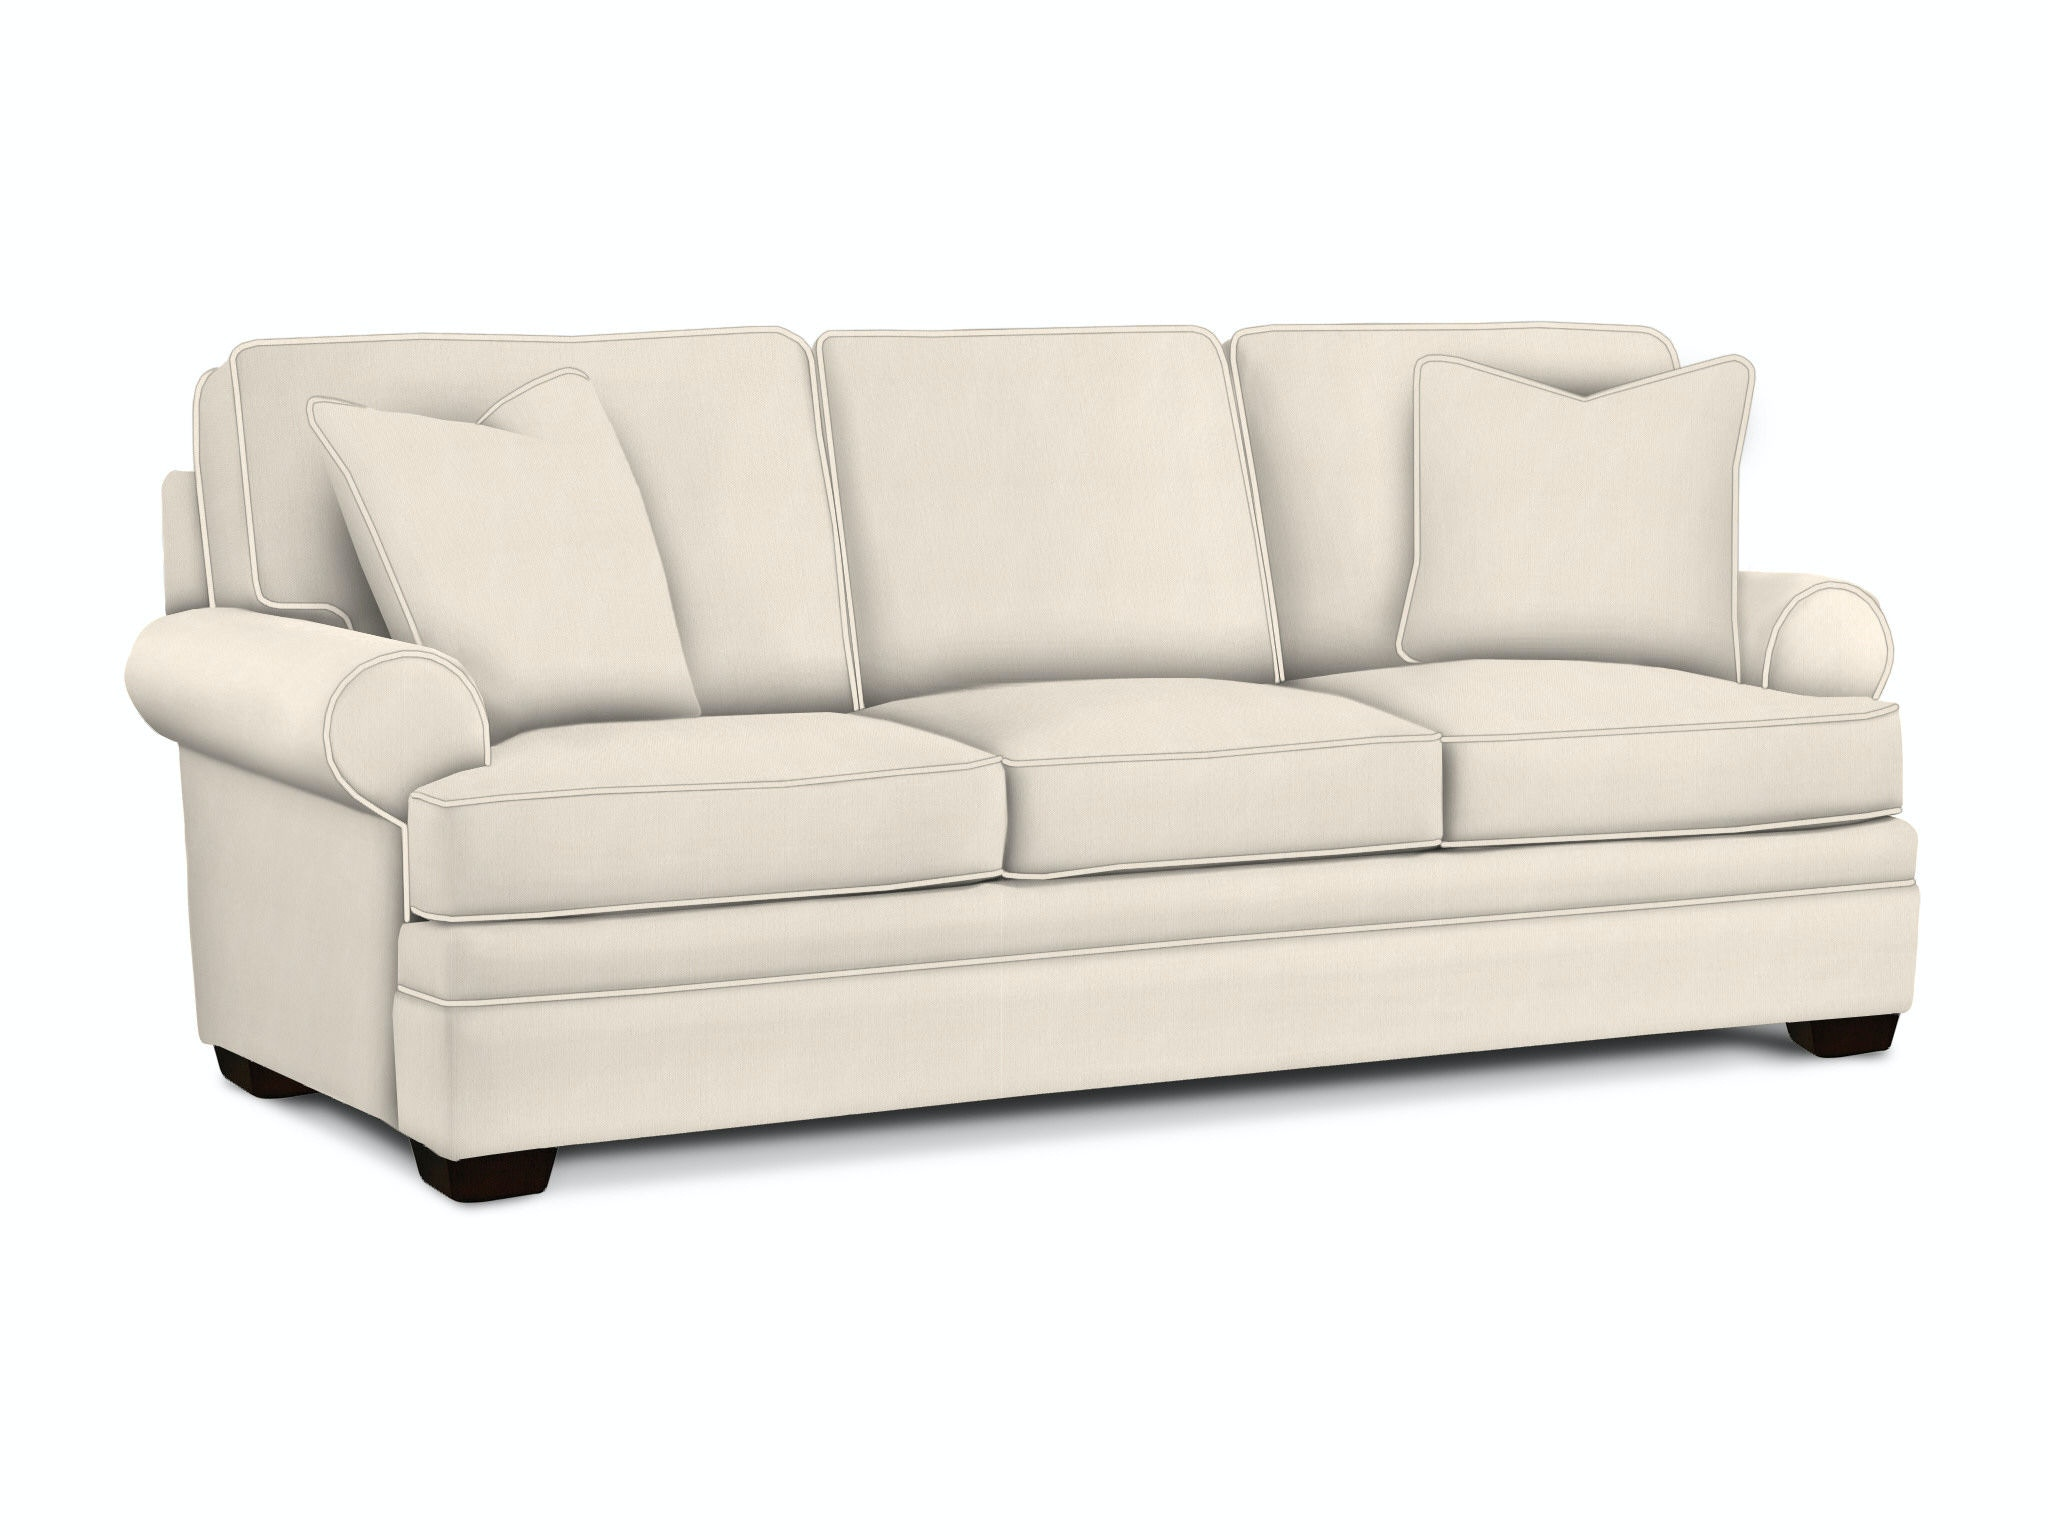 Braxton Culler Sleeper Sofa 6000 015